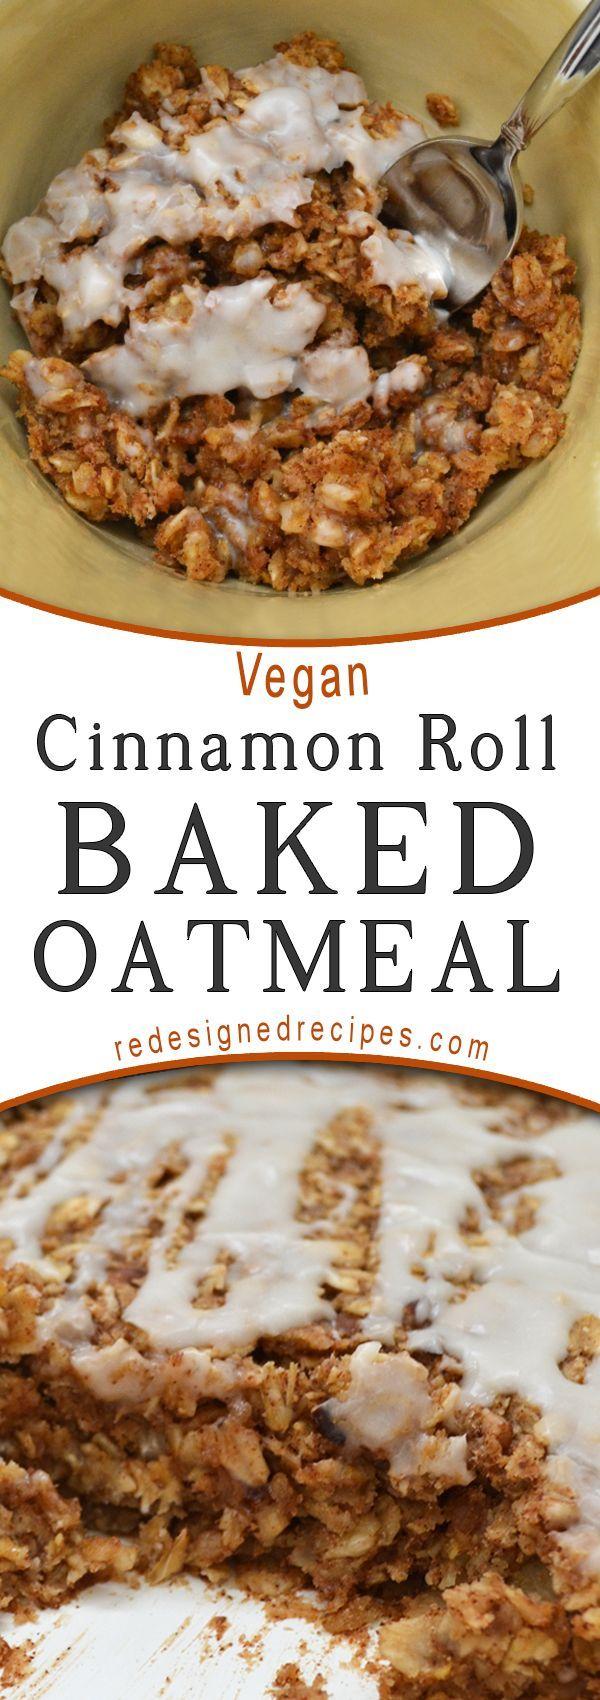 Vegan Cinnamon Baked Oatmeal